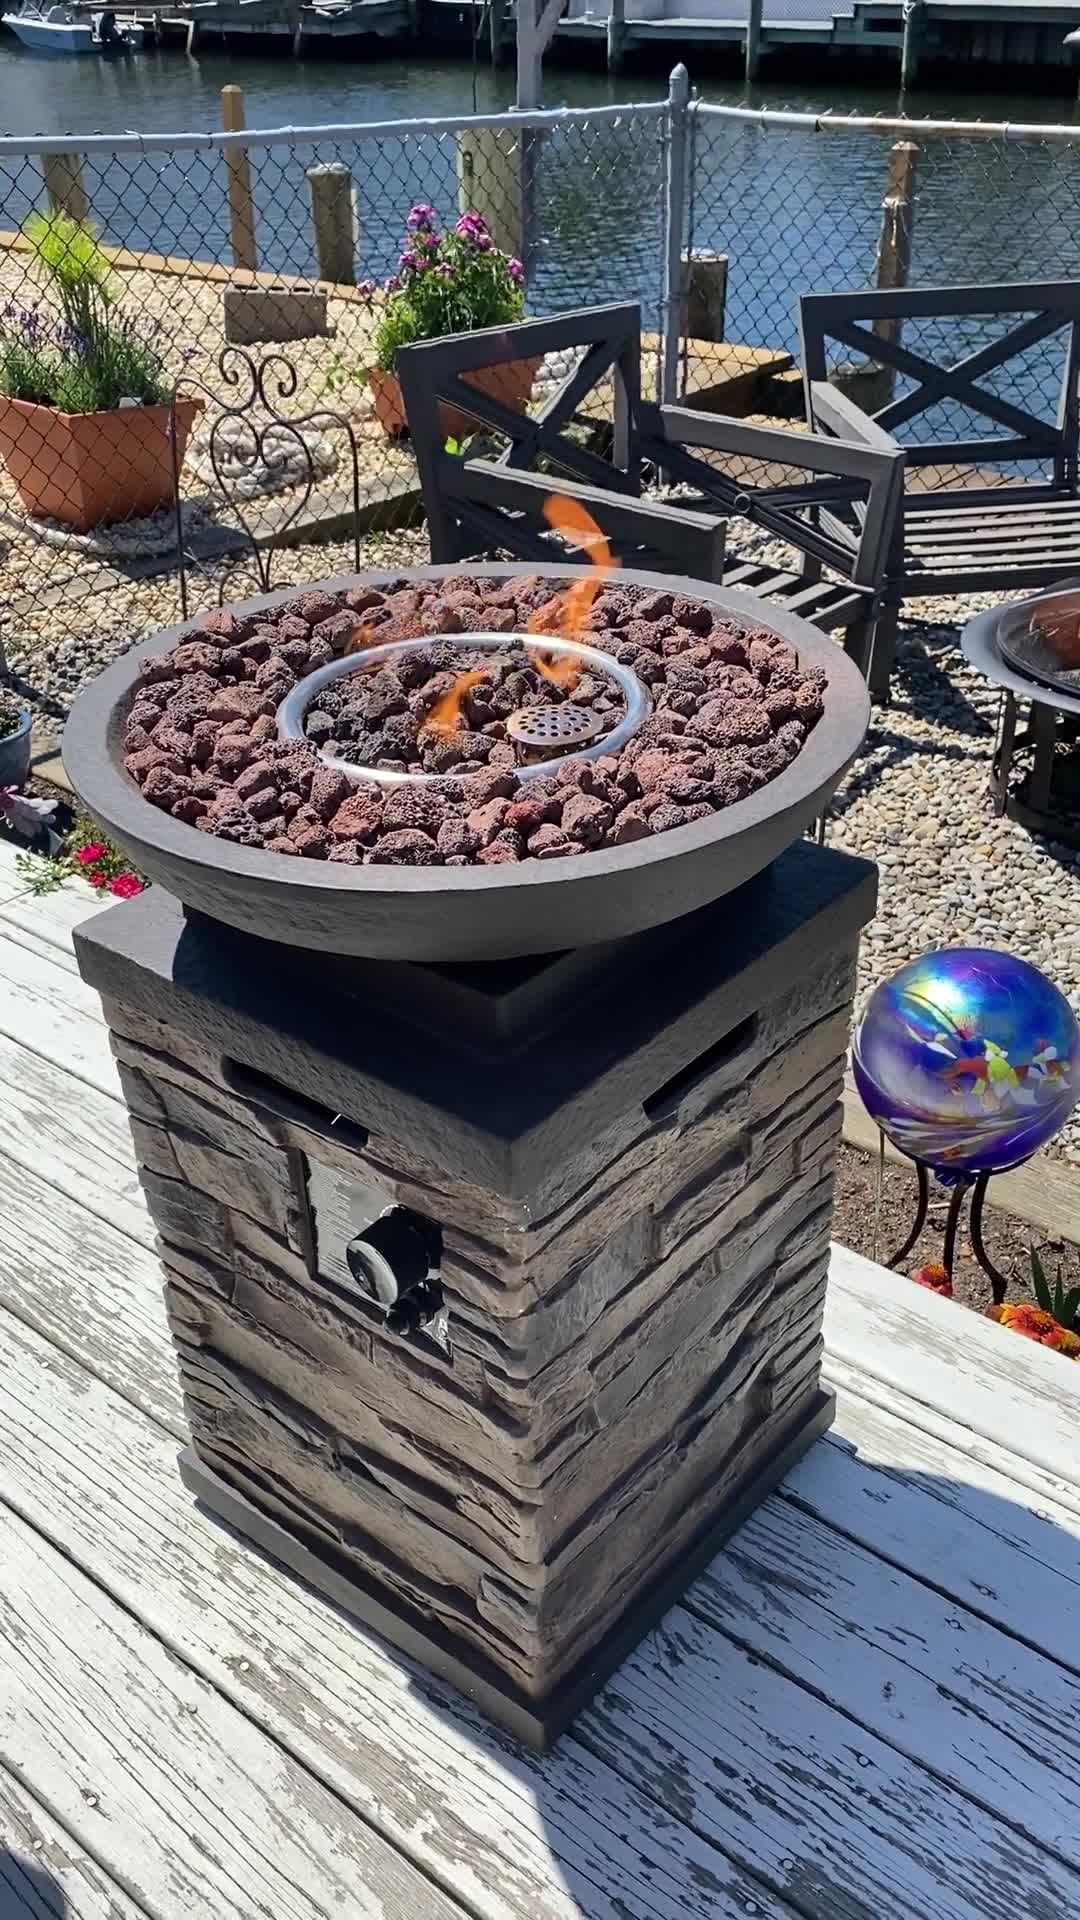 Belham Living Coronado Propane Fire Bowl With Free Cover Hayneedle Propane Fire Bowl Fire Bowls Gas Firepit